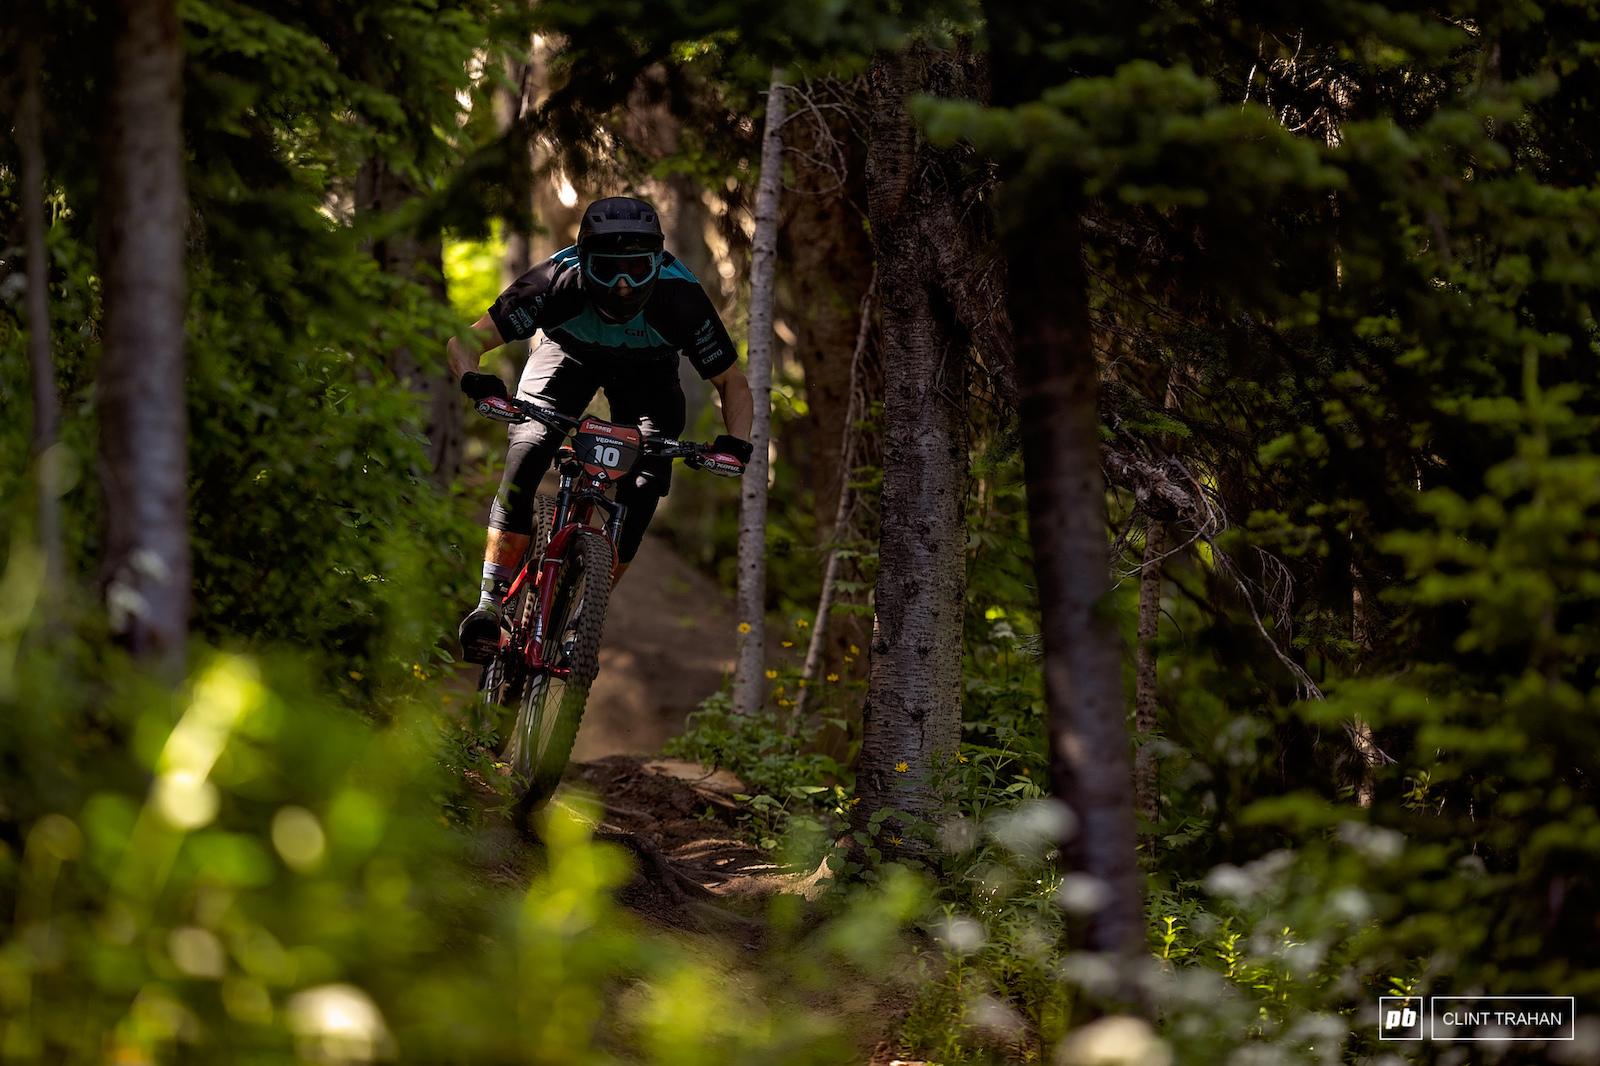 Rhys Verner riding Kona